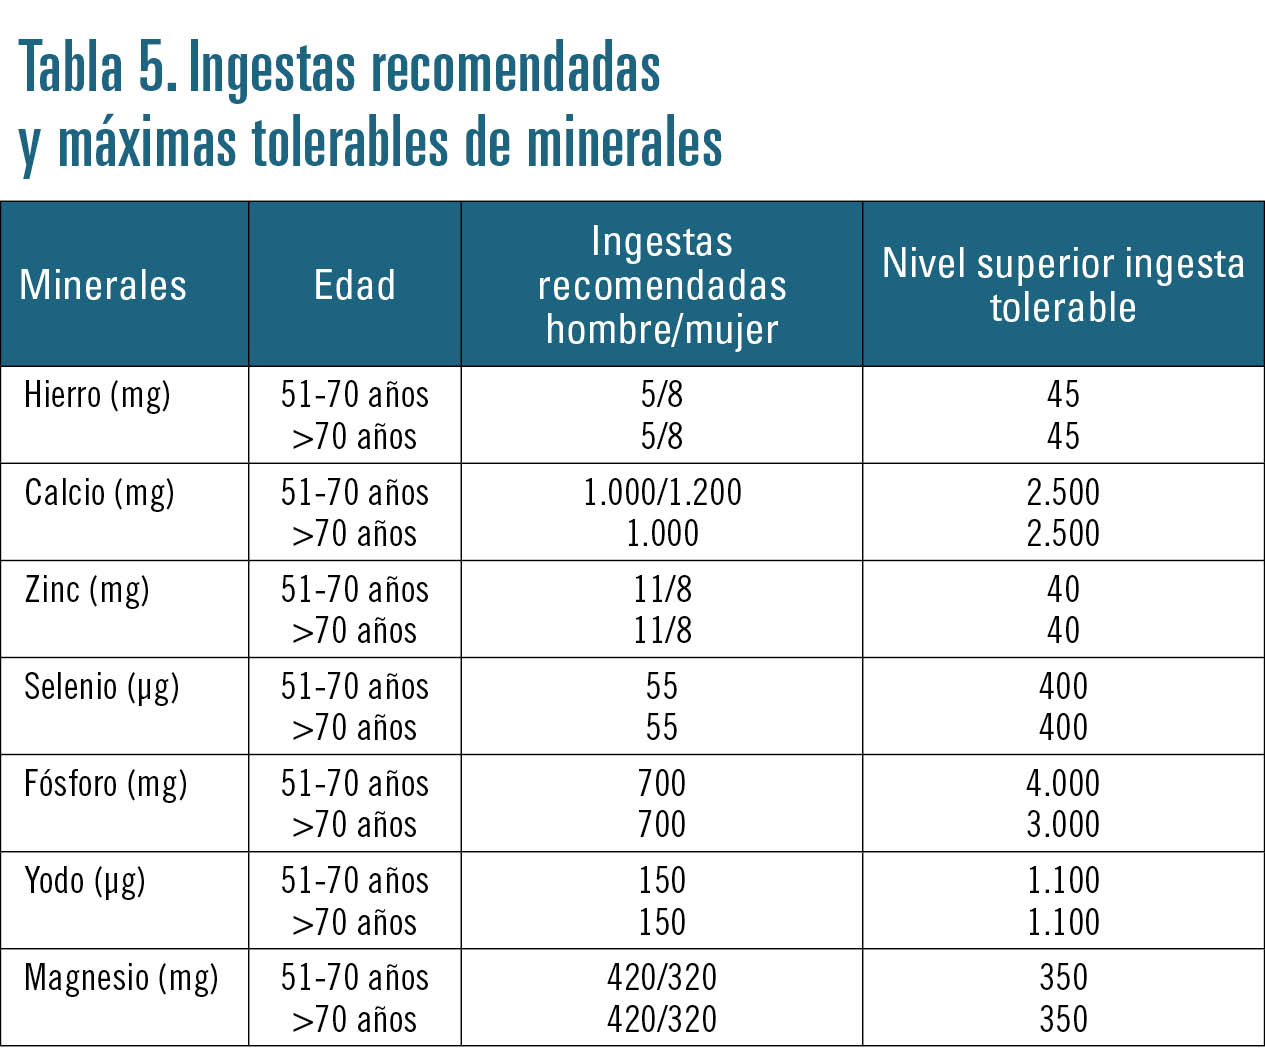 TABLA 5 CURSO